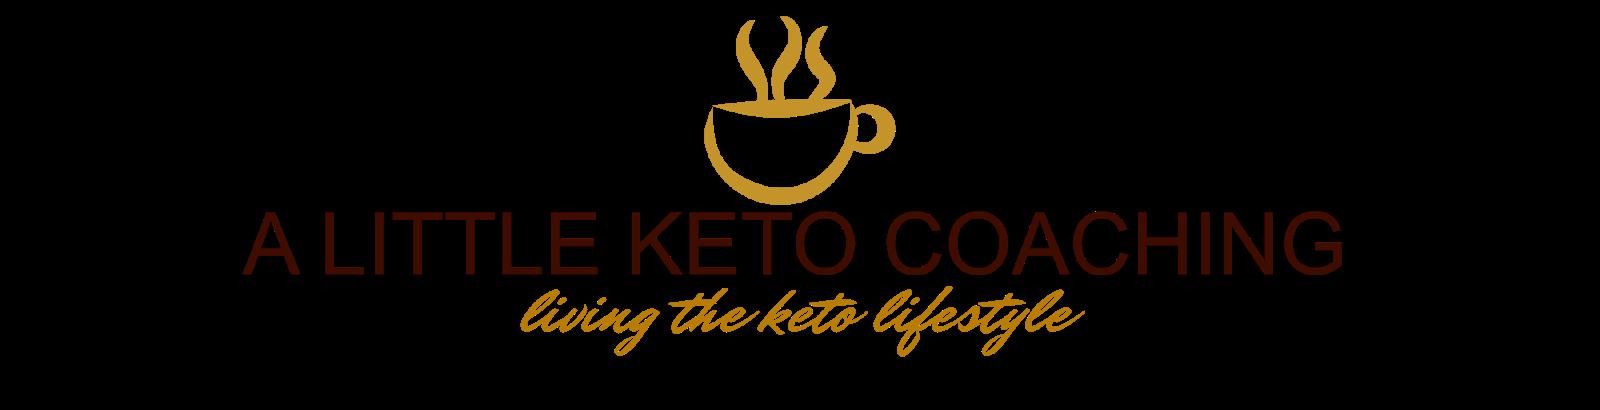 A Little Keto Coaching